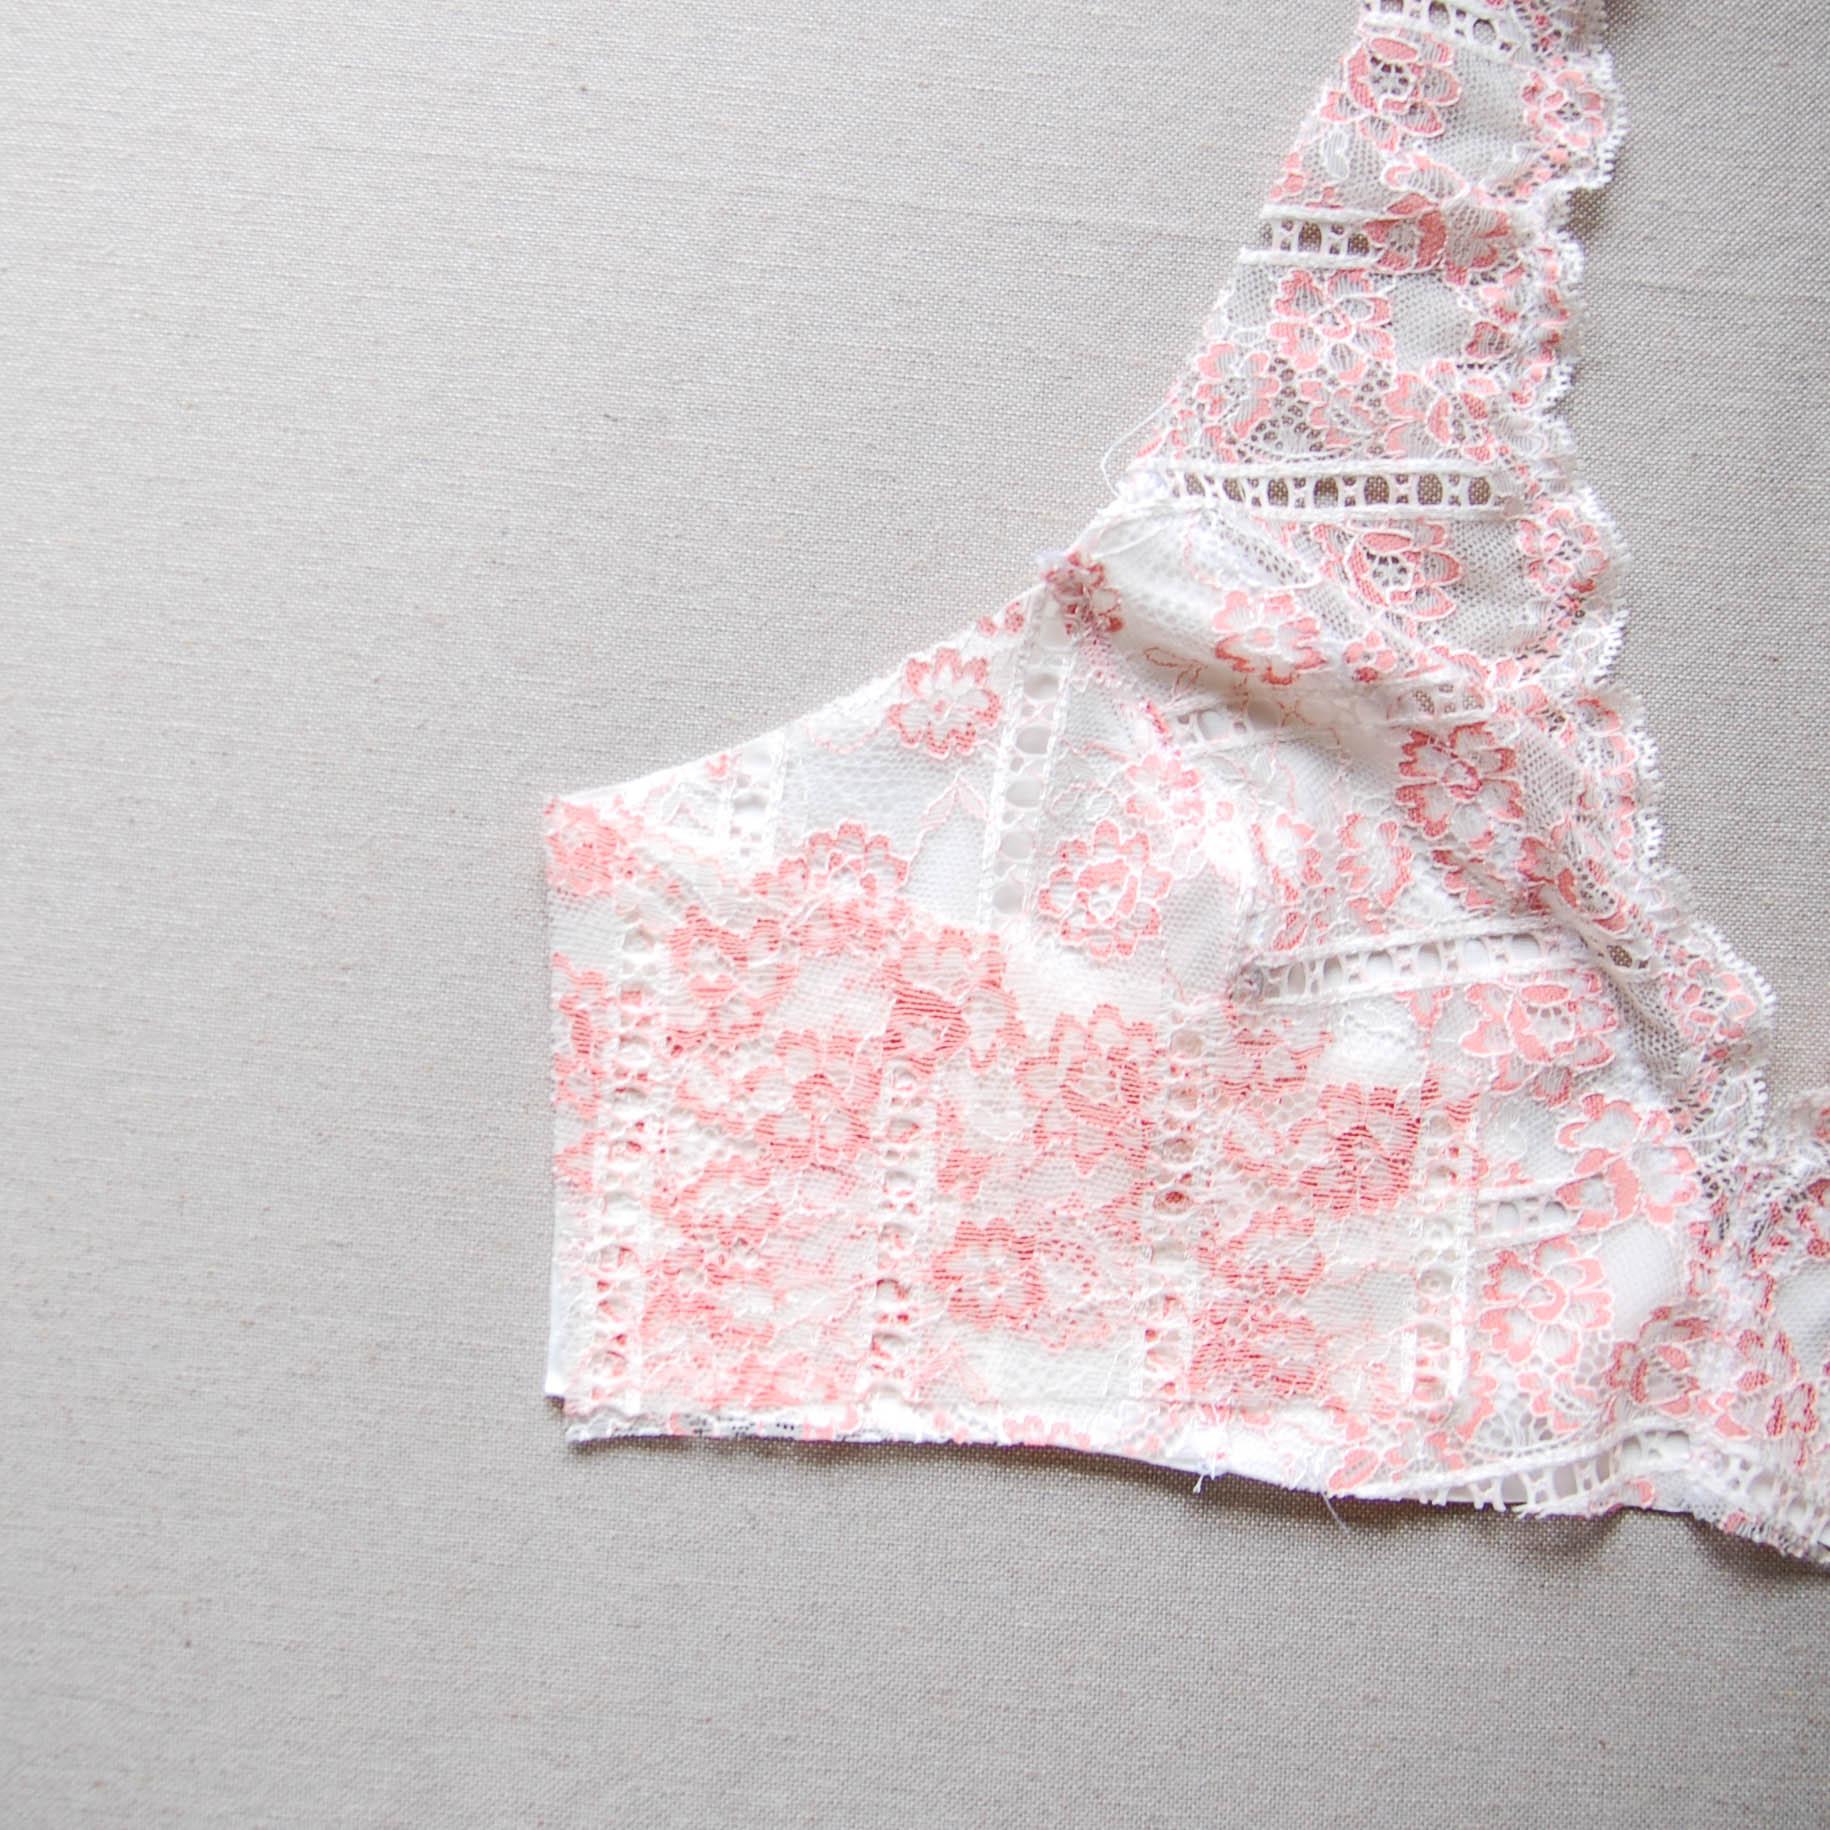 DSC_0475.jpgwww.studiocostura.com